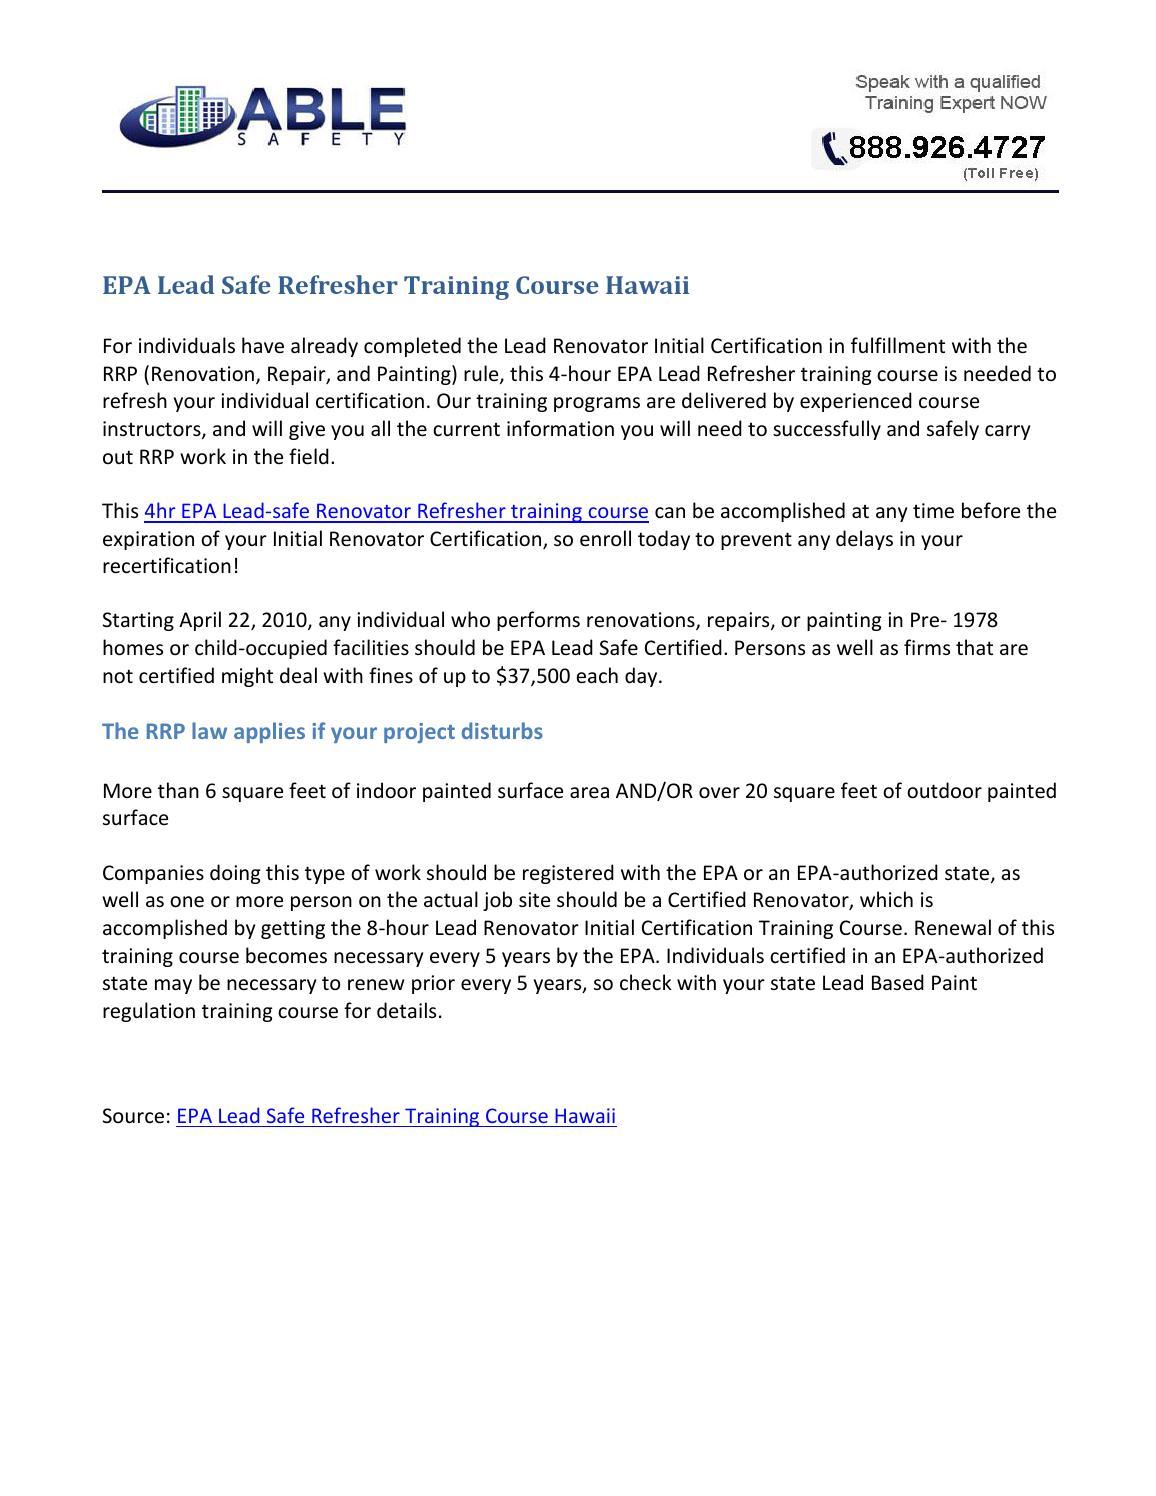 Epa Lead Safe Refresher Training Course Hawaii By John Madrigal Issuu